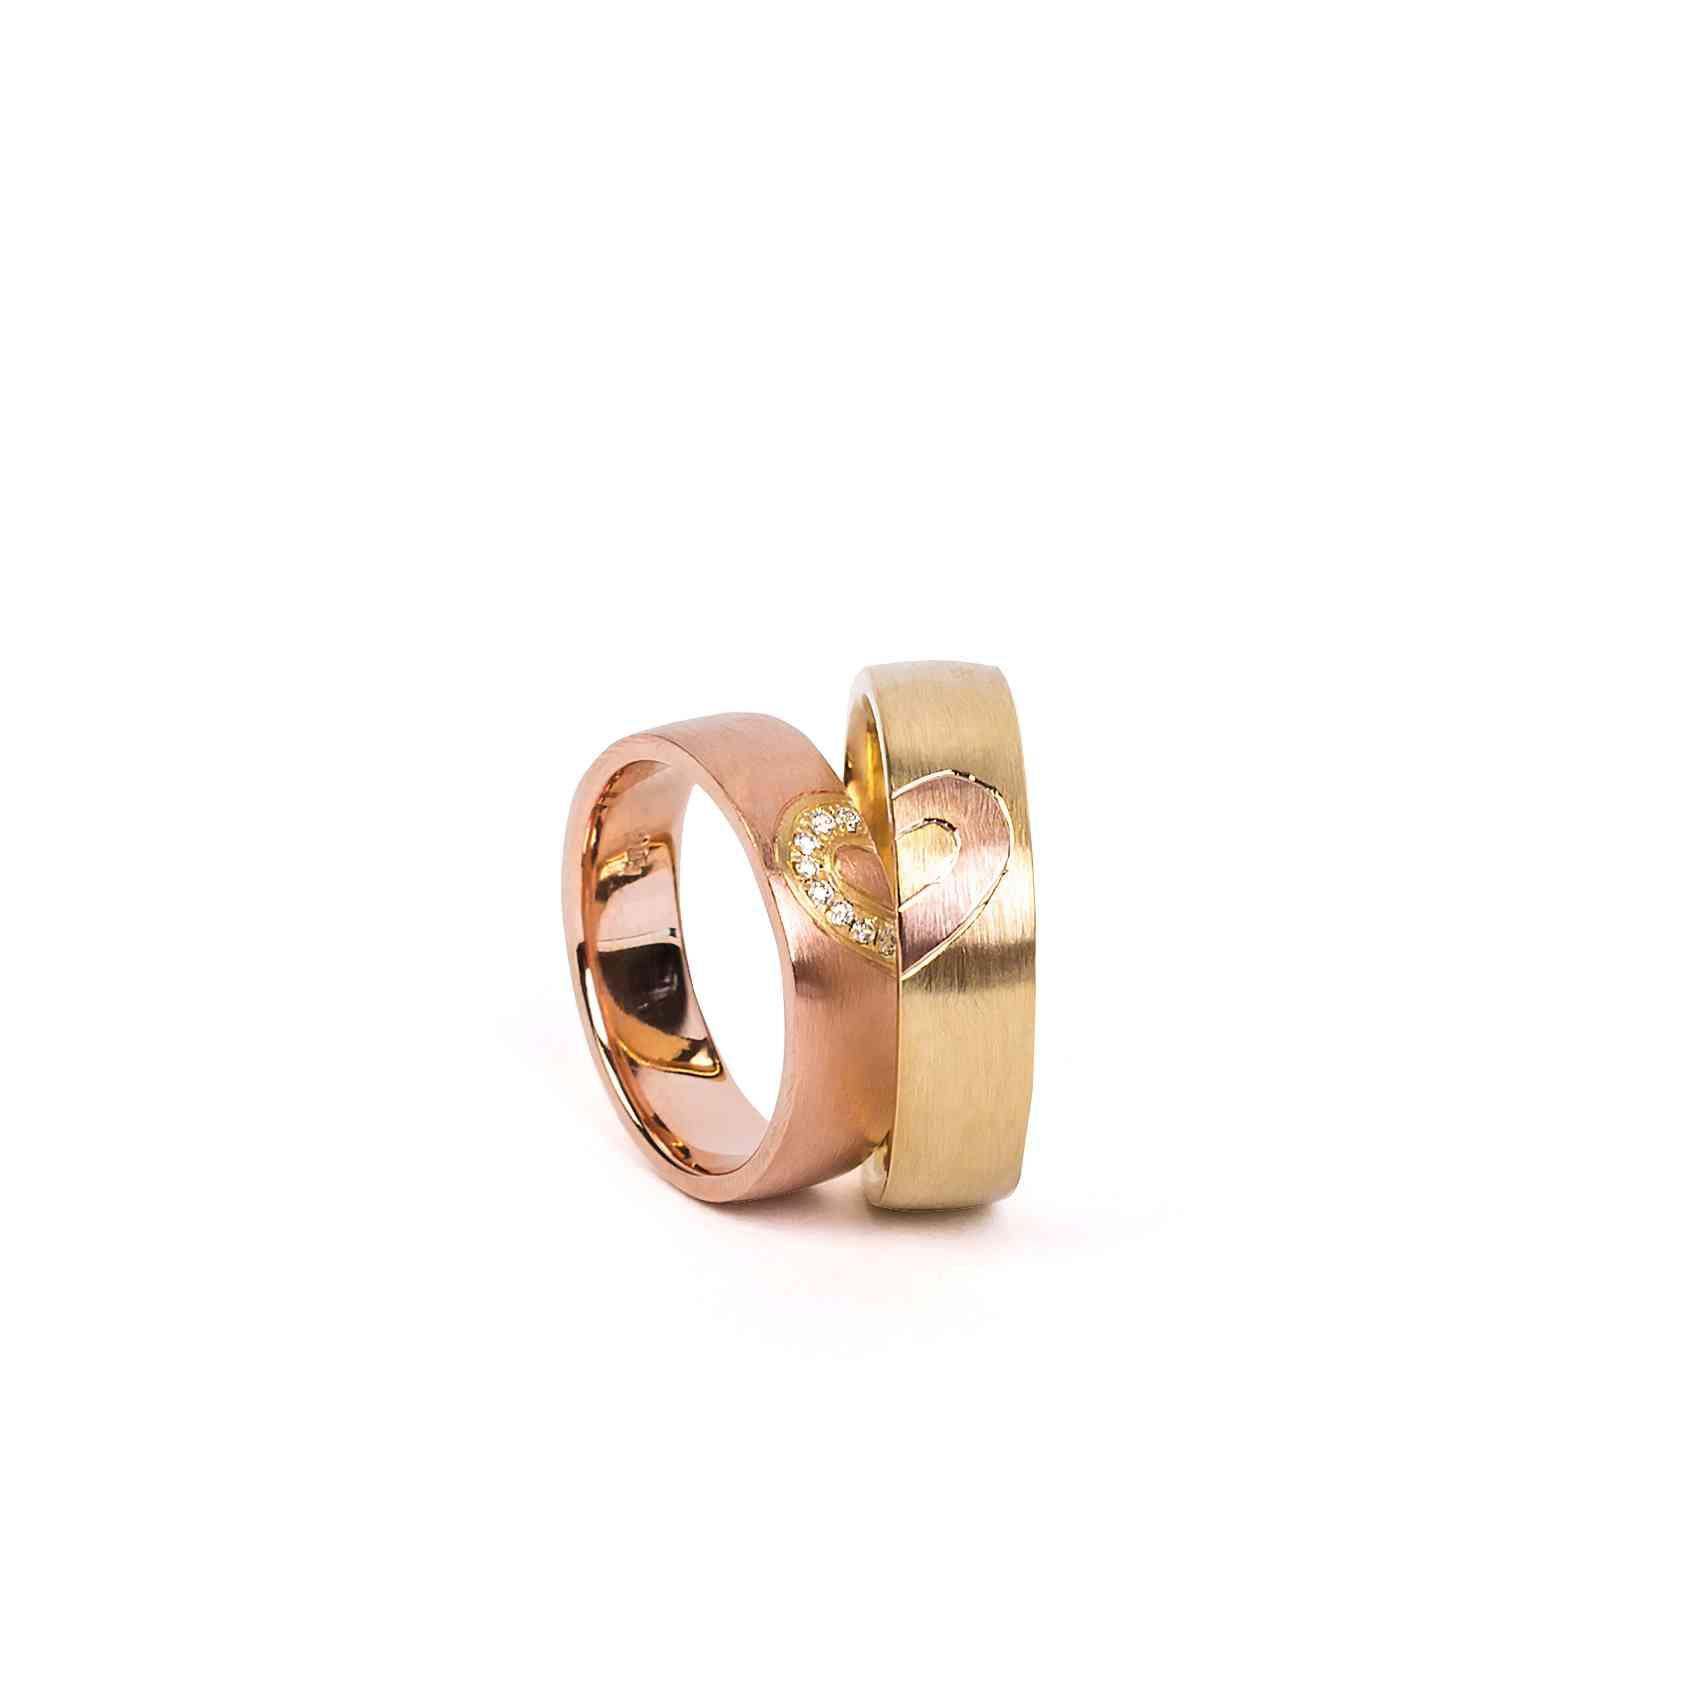 Set Verighete Din Aur Roz Și Galben 14K Cu Diamante